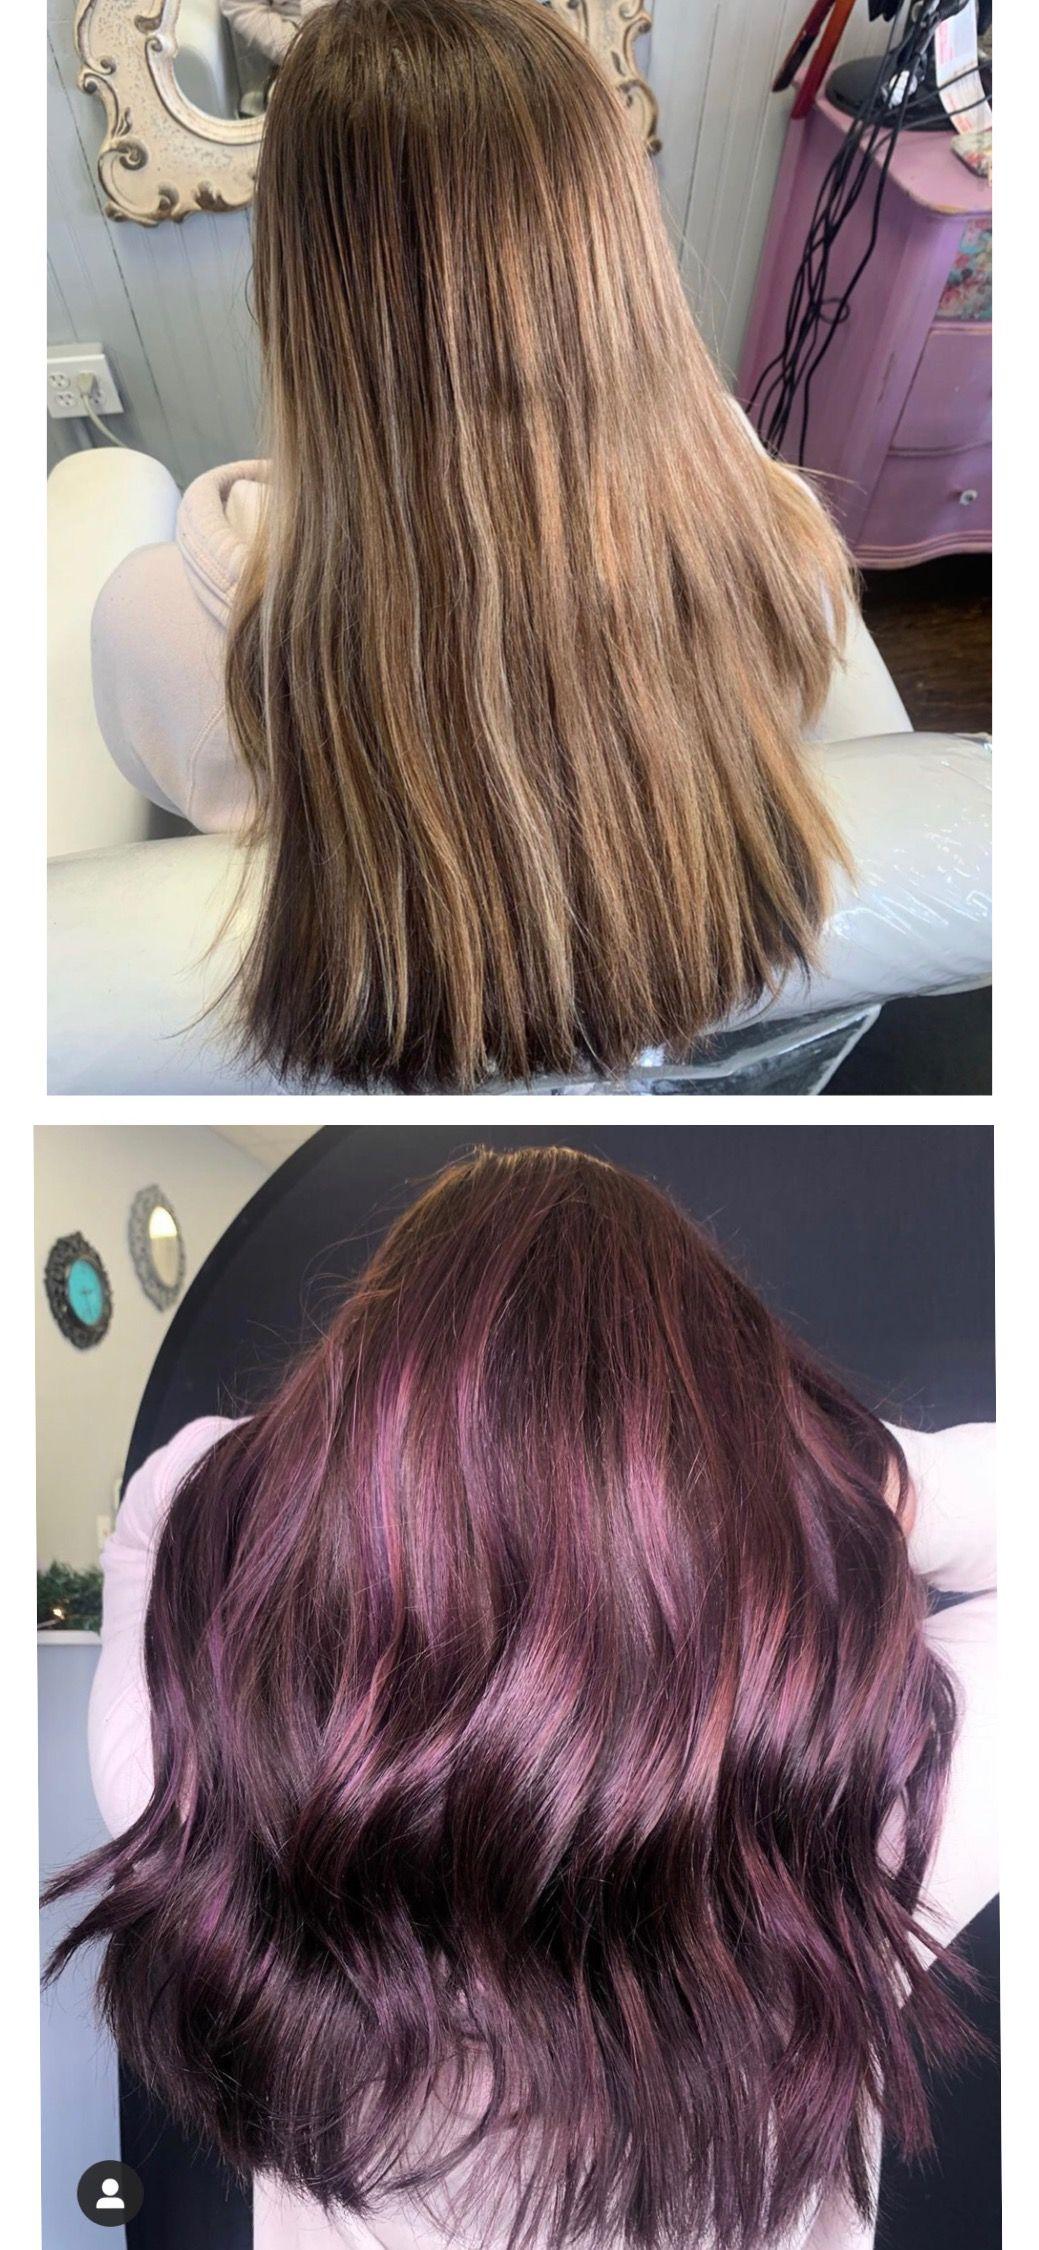 Purple Tinted Hair In 2020 Purple Tinted Hair Hair Tint Hair